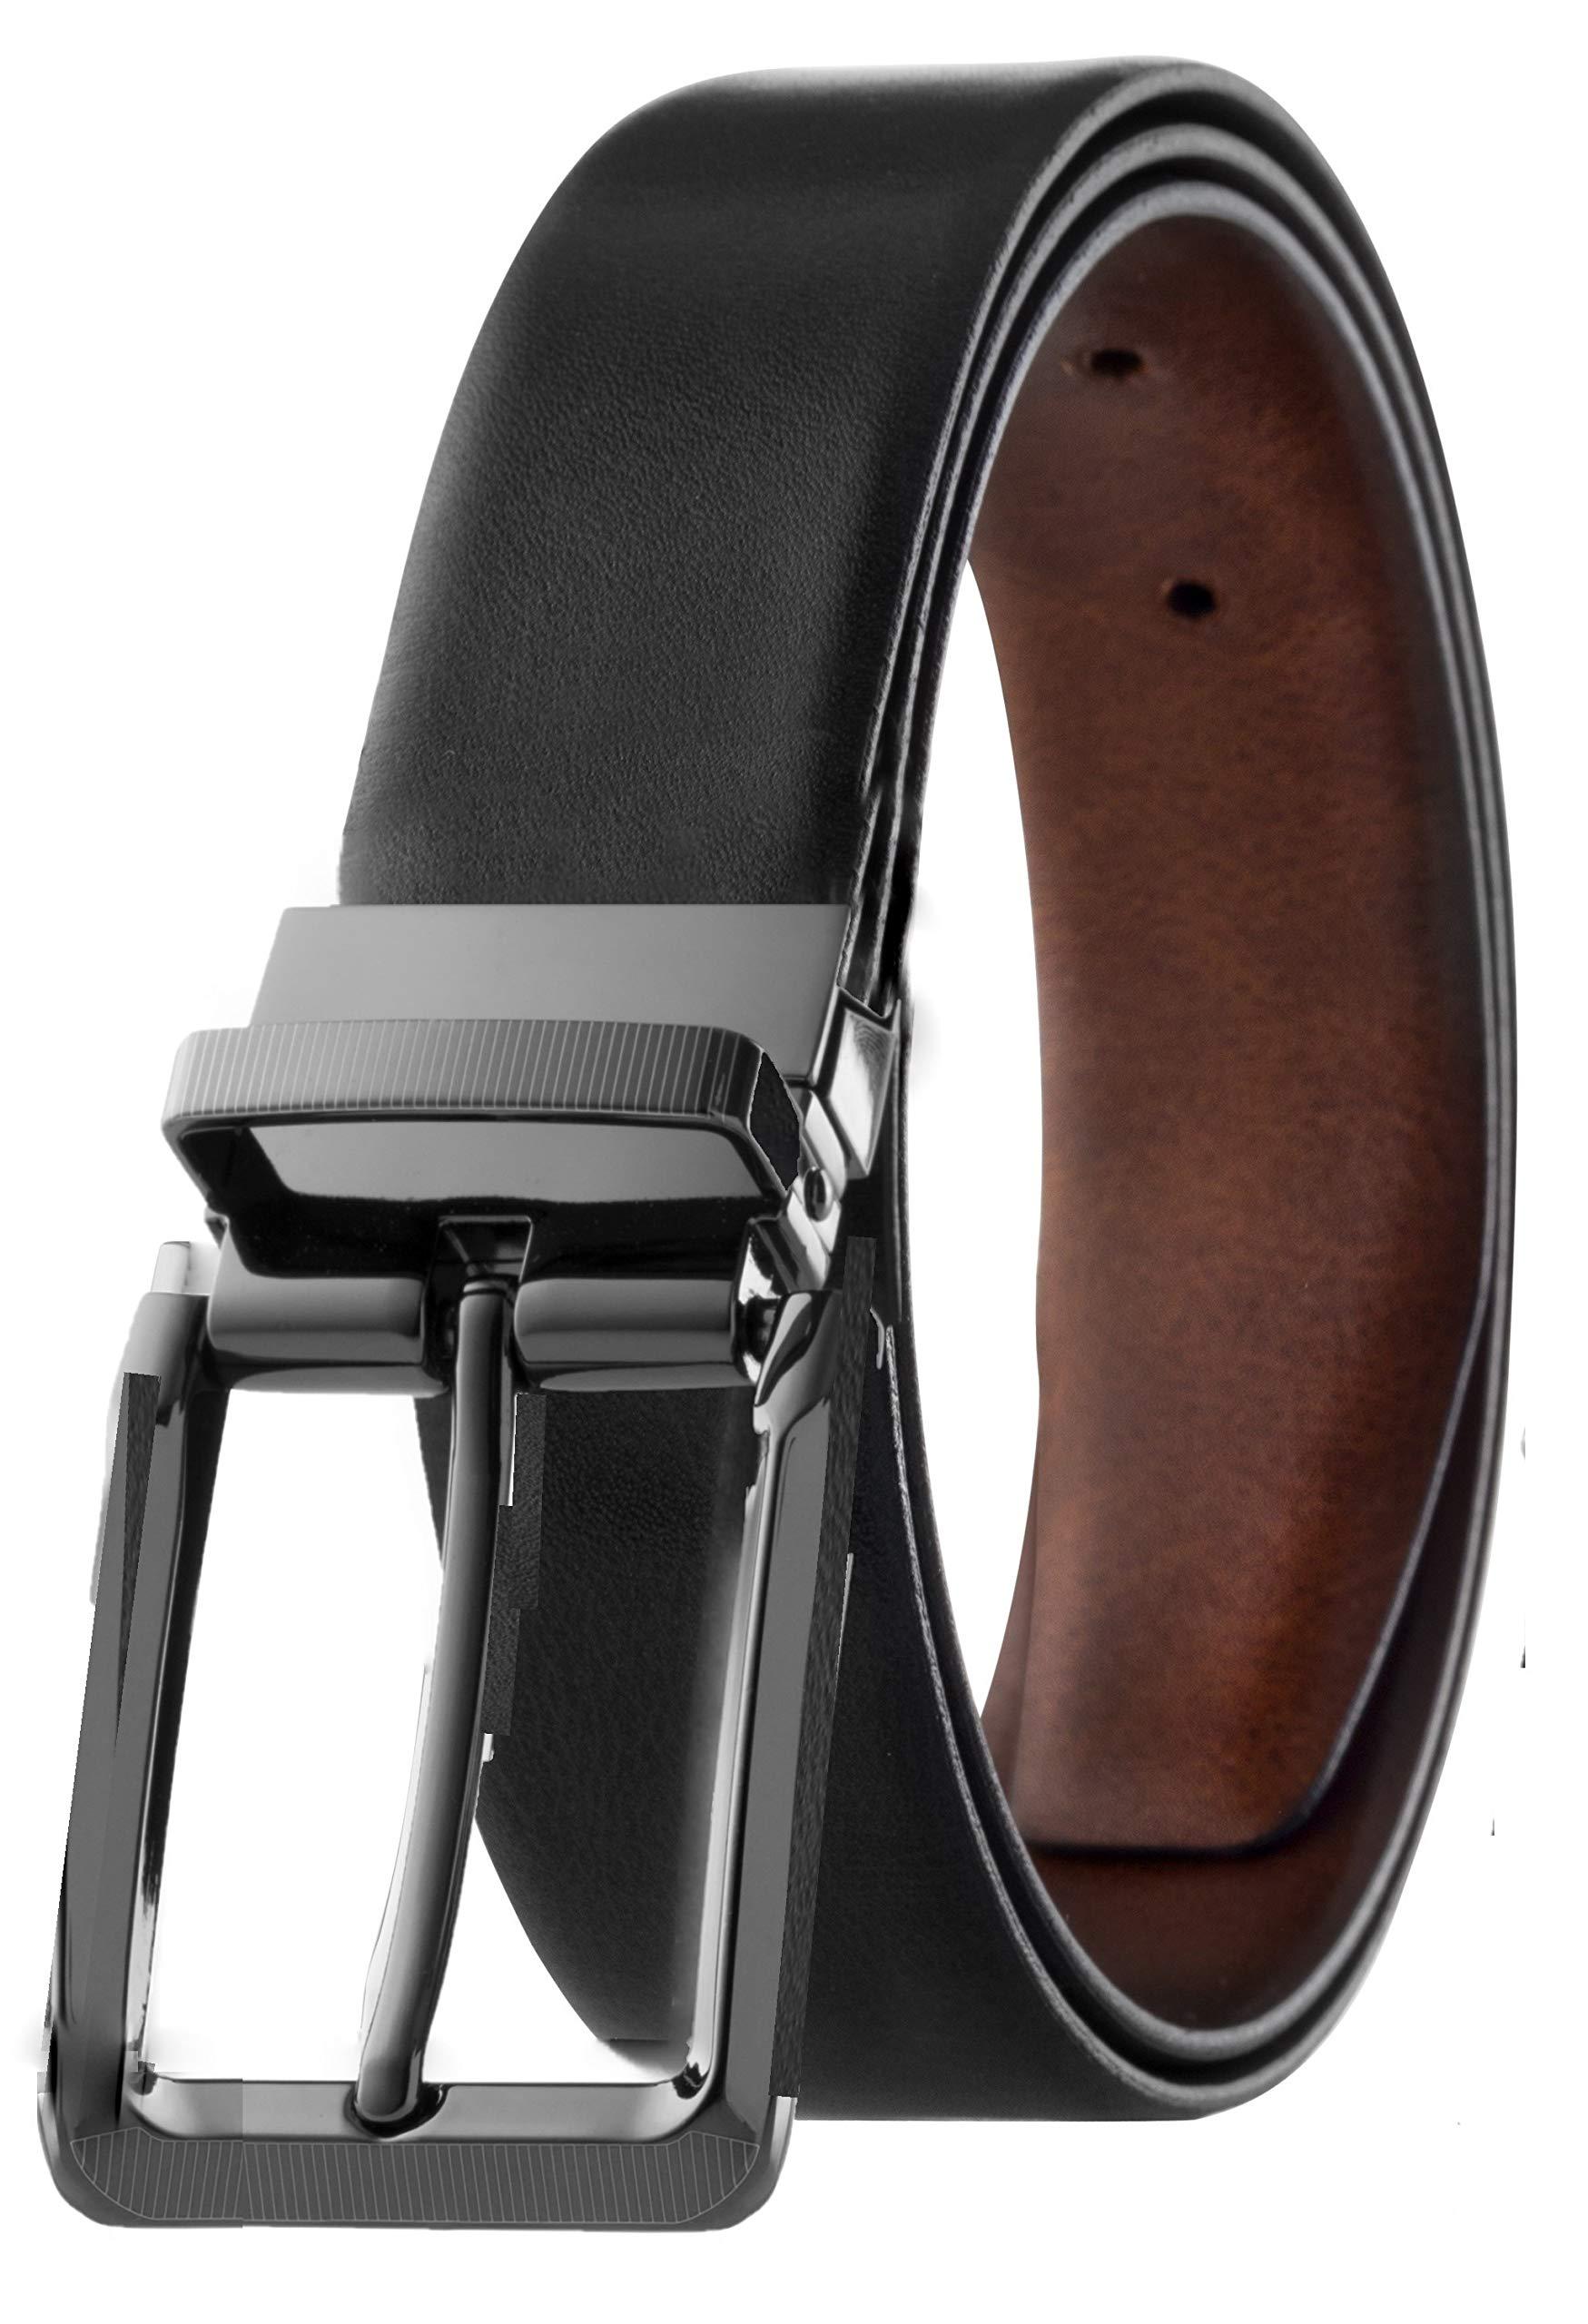 Mens Top Grain Leather Reversible Belt Italian Leather Black & Brown Marble Design Size 38